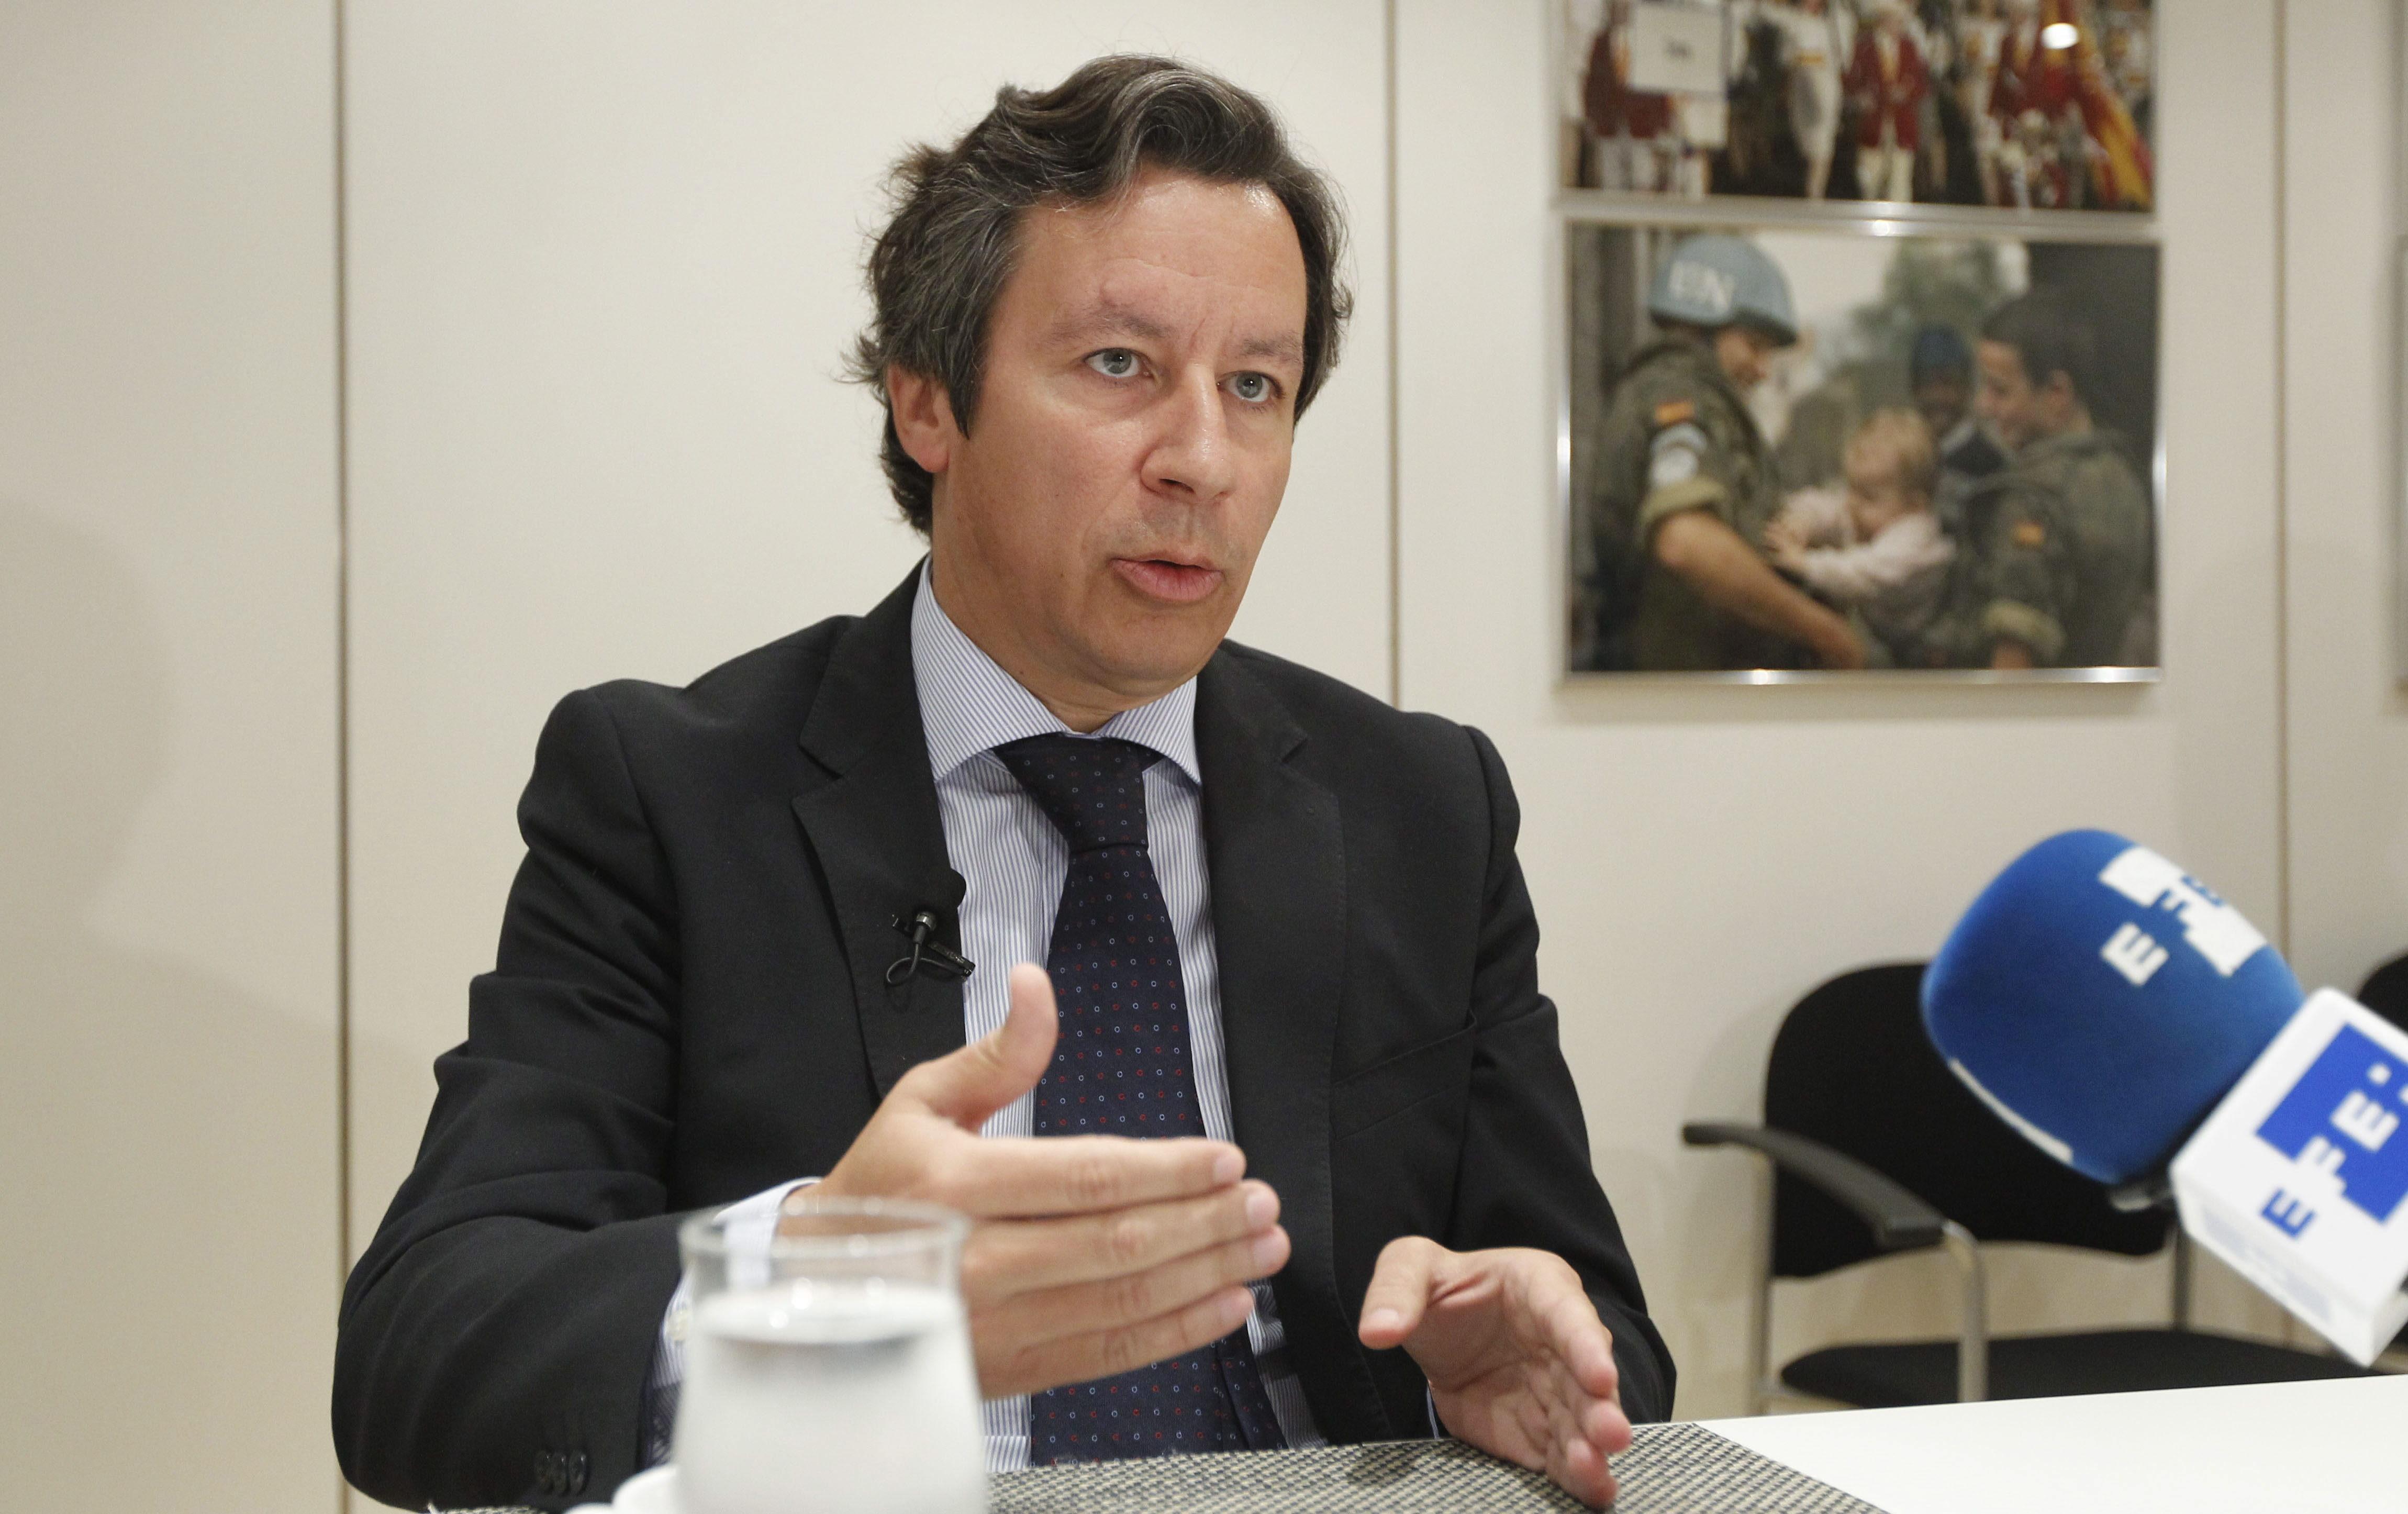 Alonso critica que al PP se le apliquen correctivos por ser más transparente